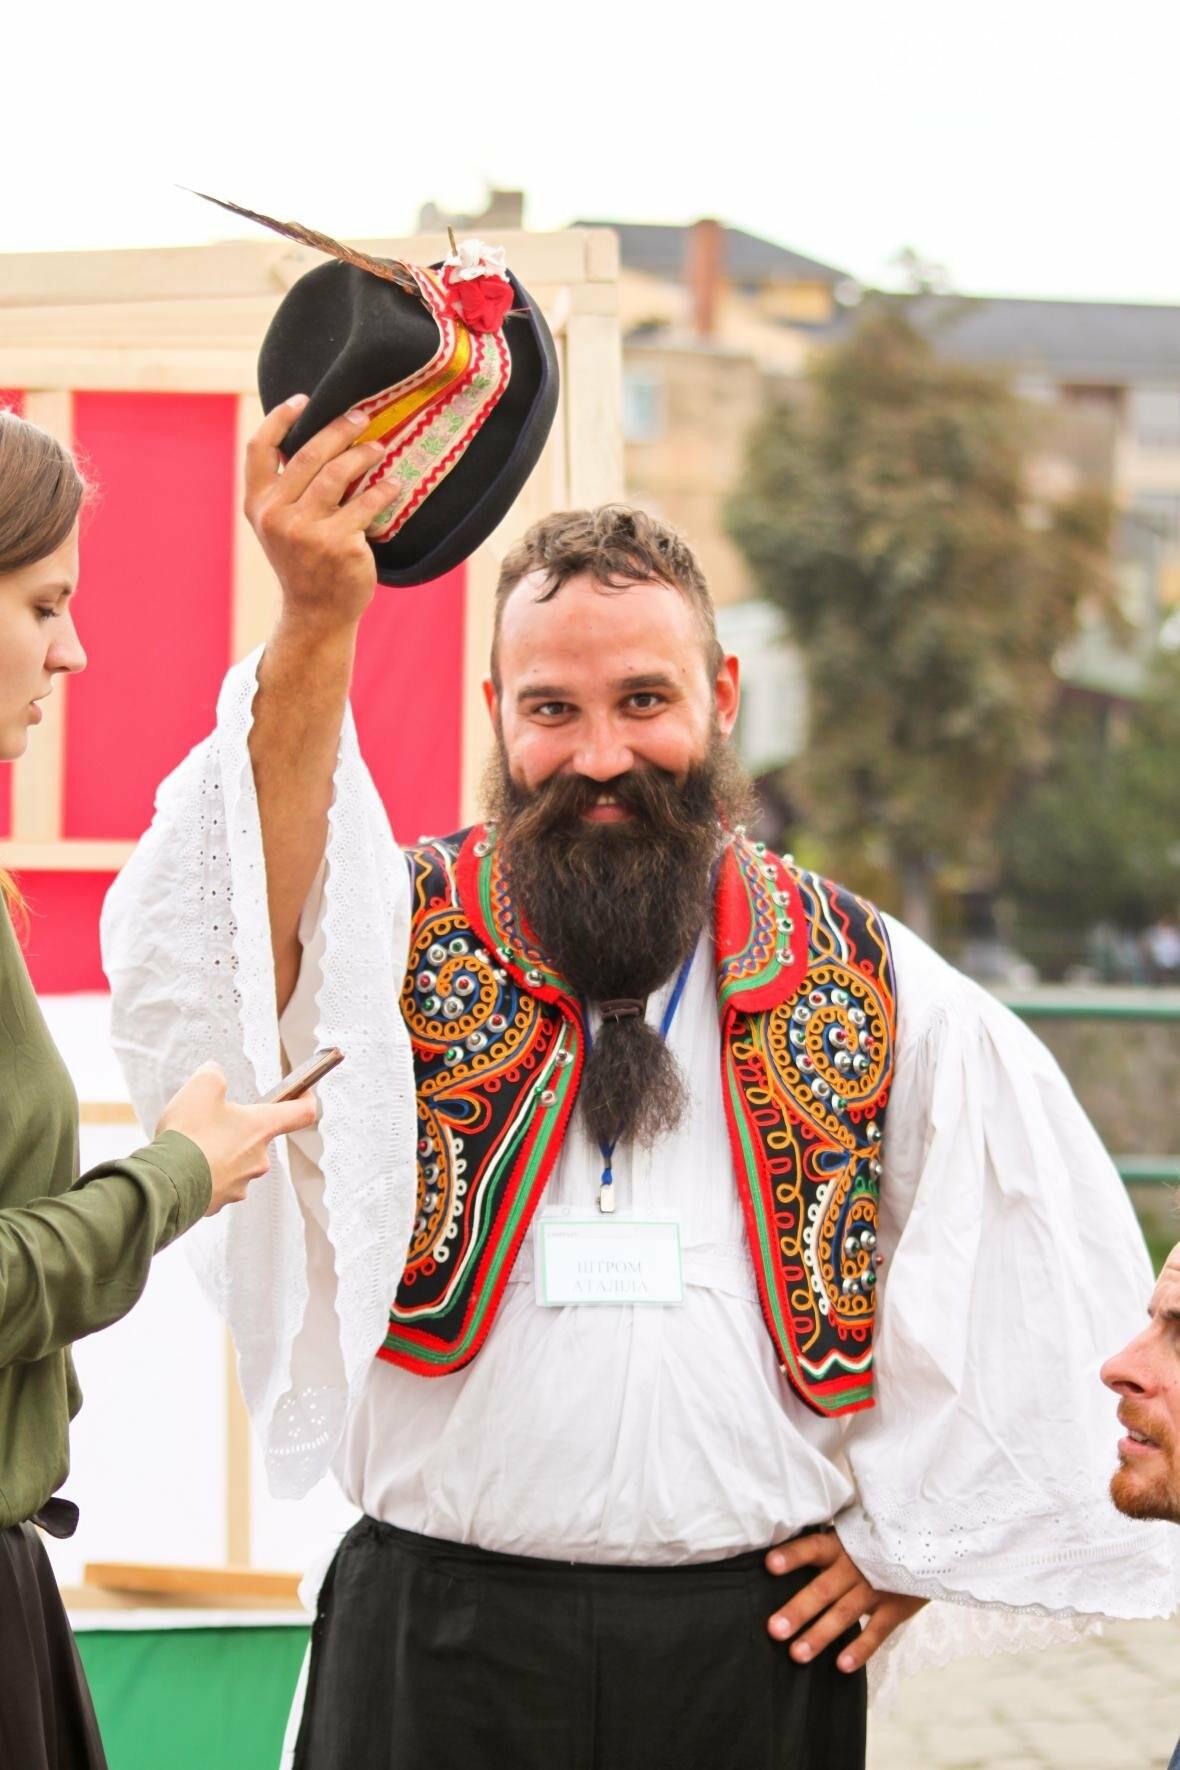 Ужгород говорив мовою сердець: на Театральній пройшло мультикультурне свято (ФОТОРЕПОРТАЖ), фото-27